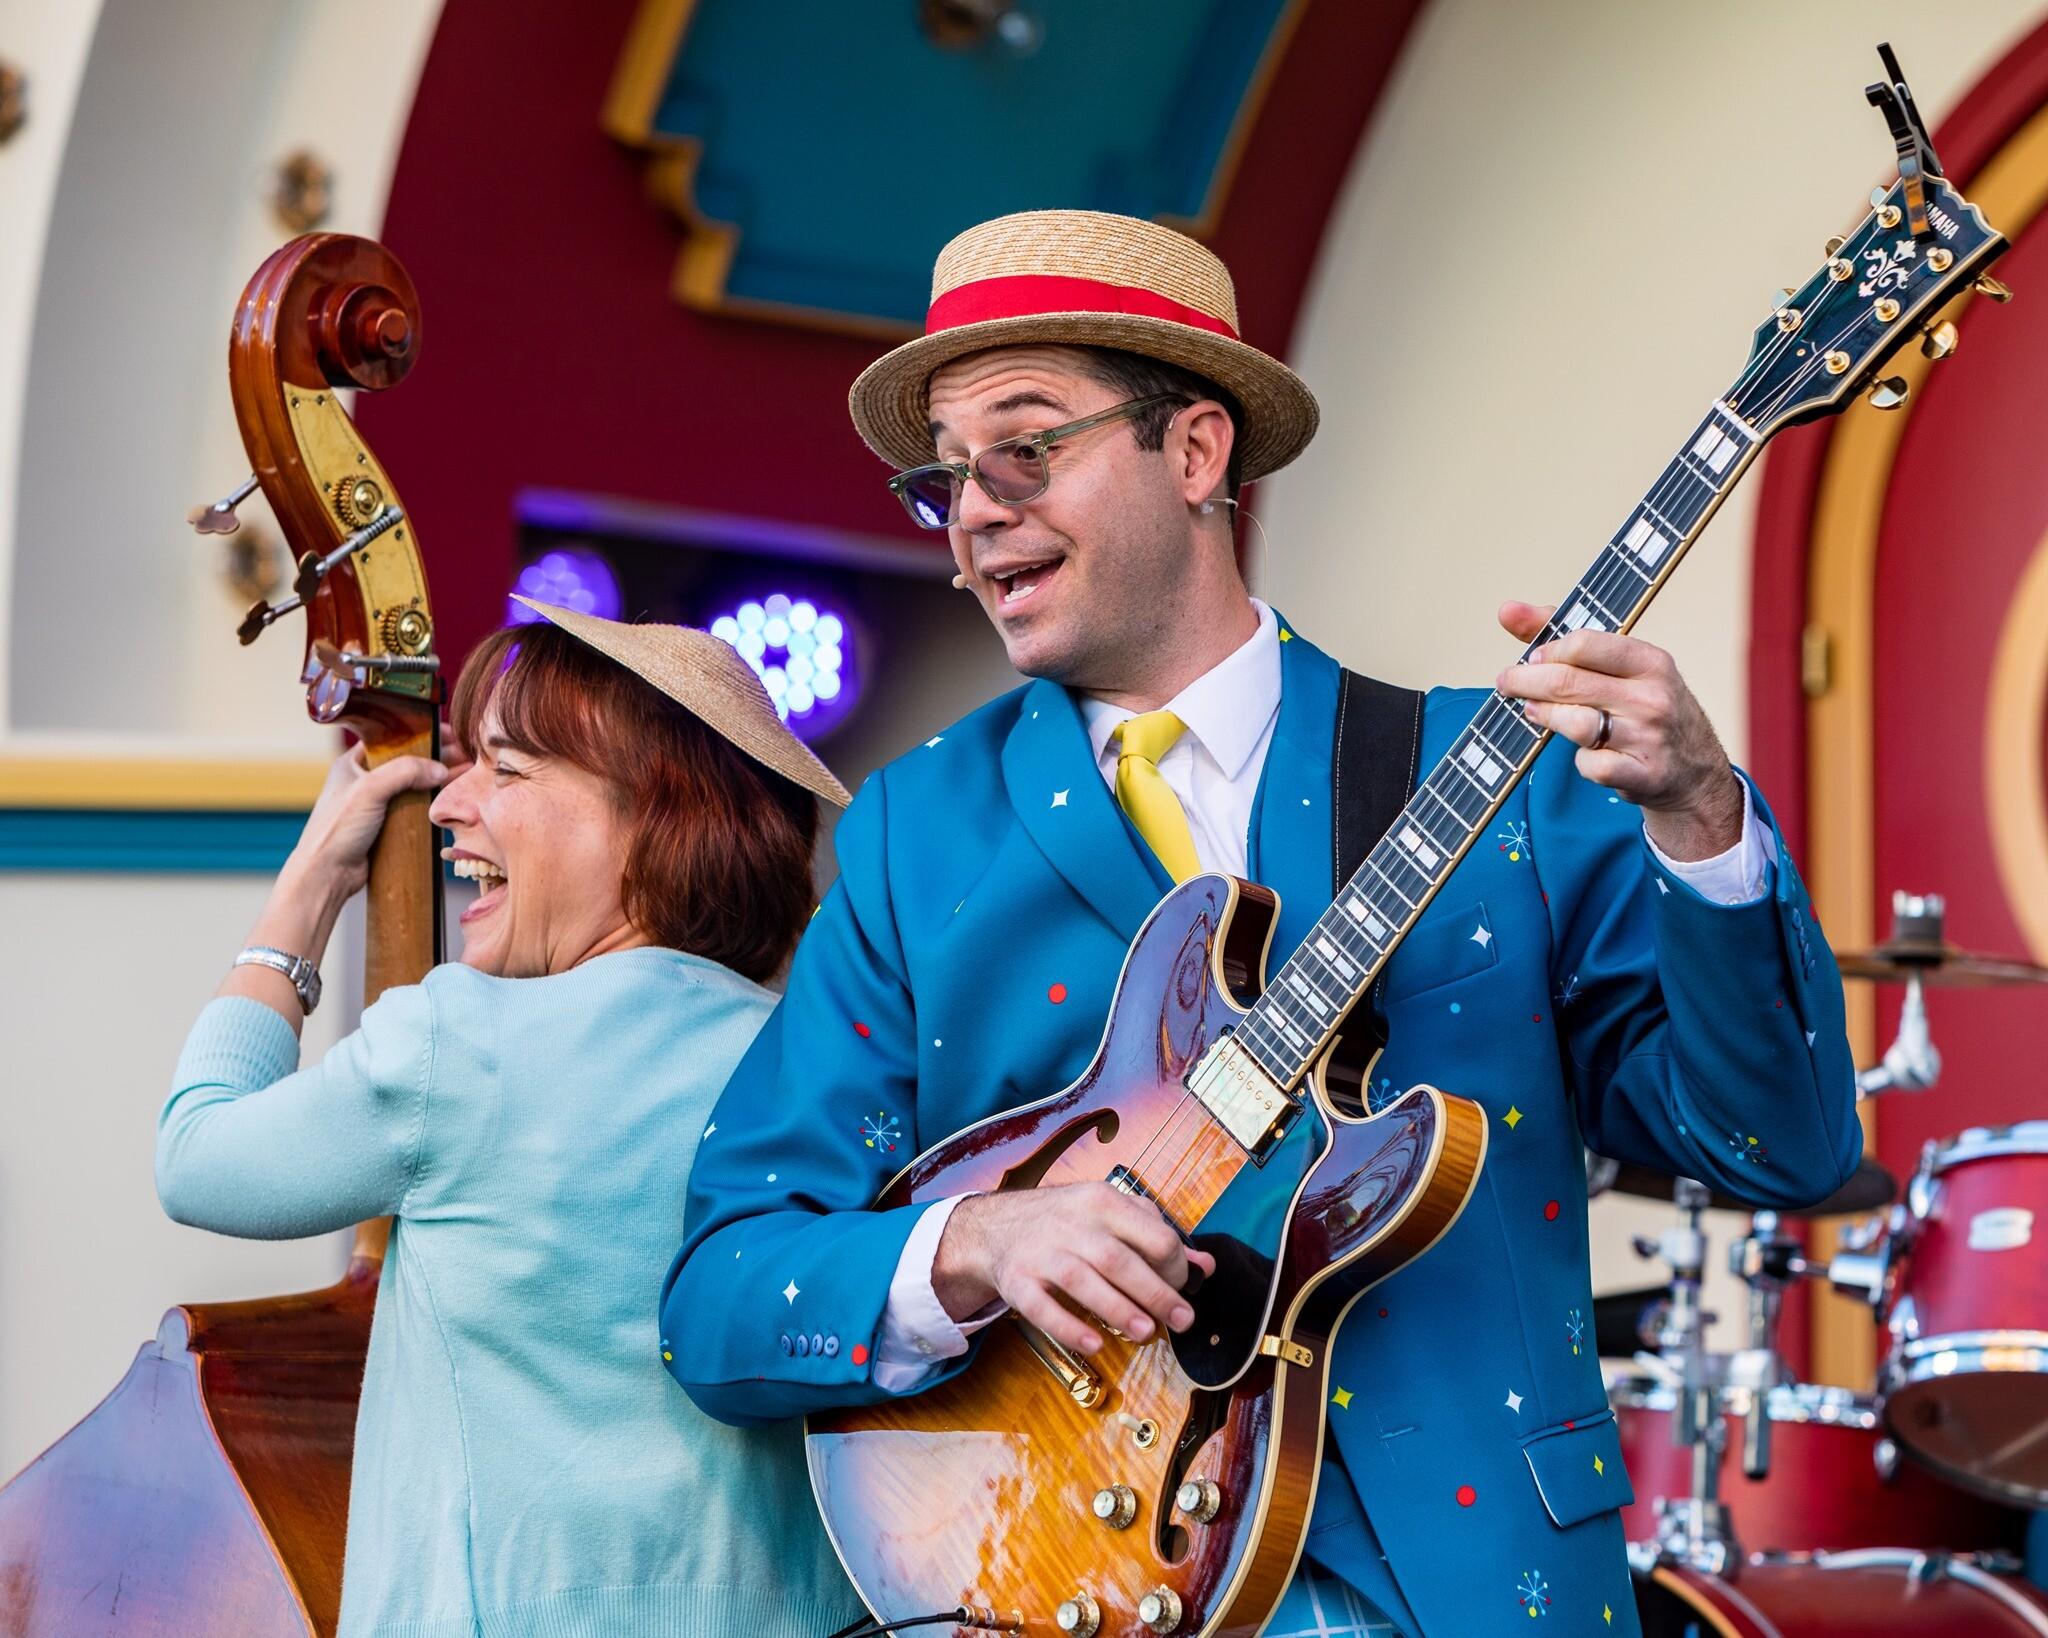 Katie Cavera and Timothy Gill at Pixar Promenade Disneyland Richard Takenaga